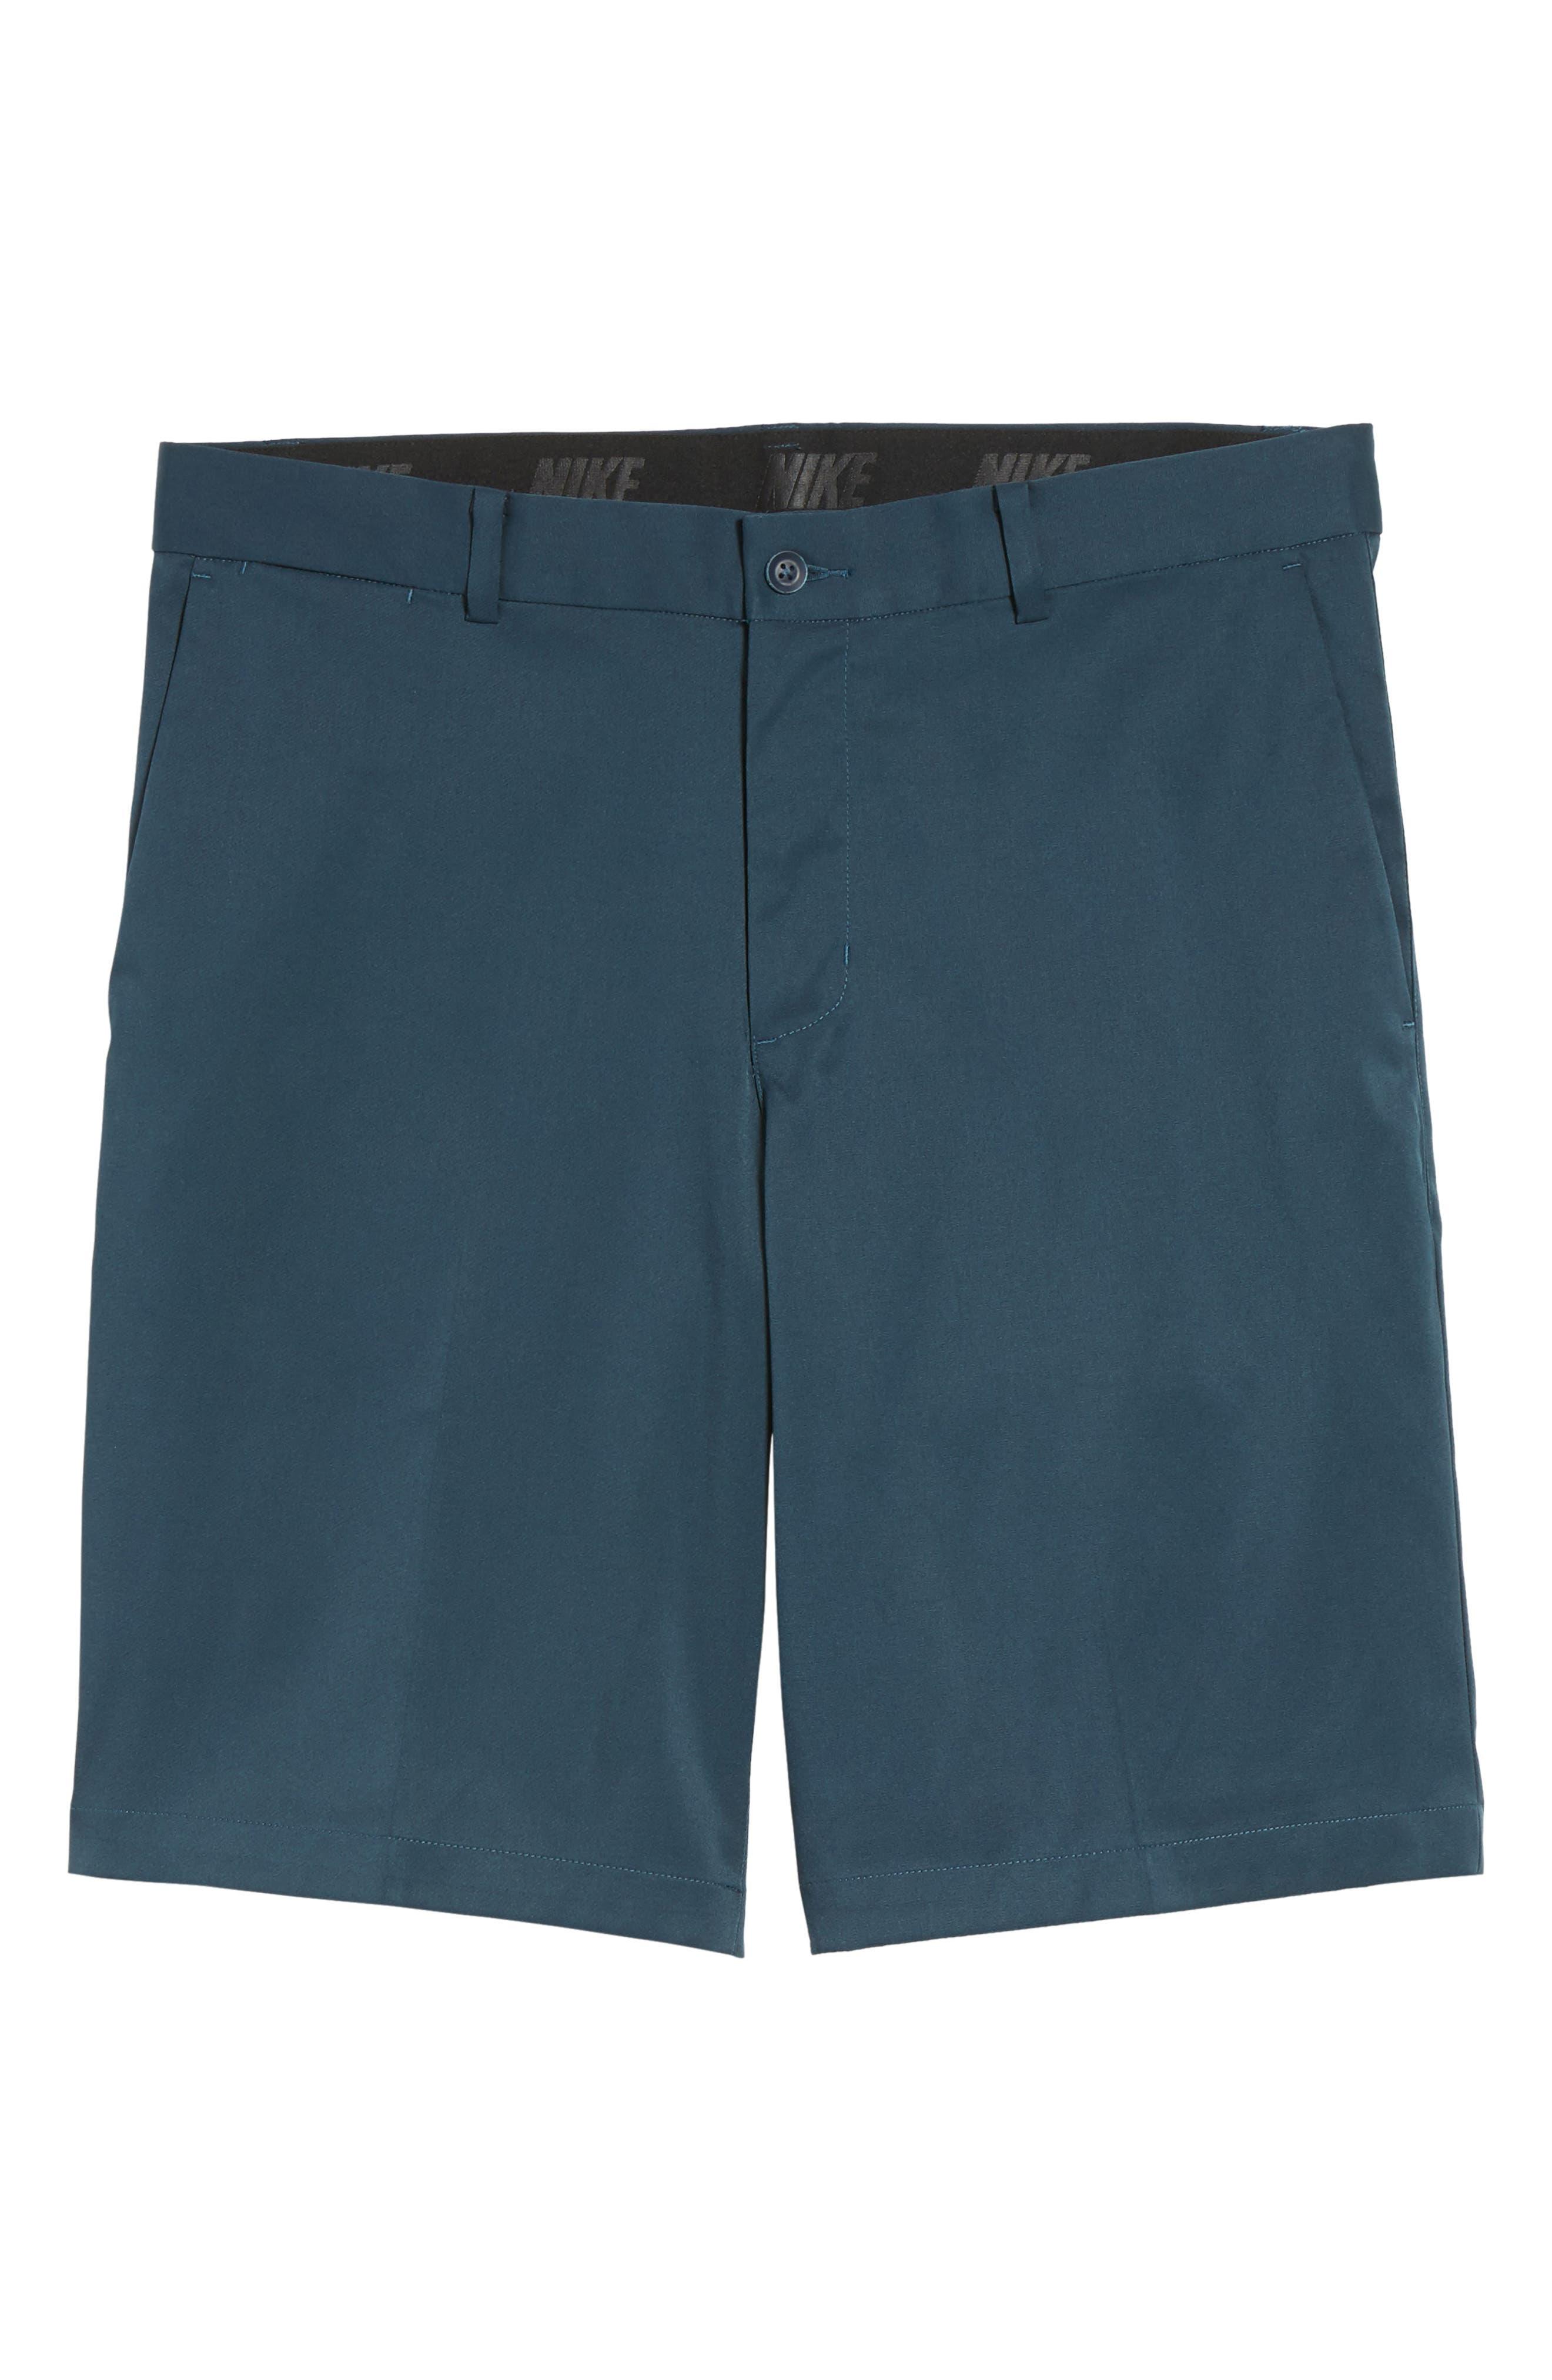 Flat Front Golf Shorts,                             Alternate thumbnail 43, color,